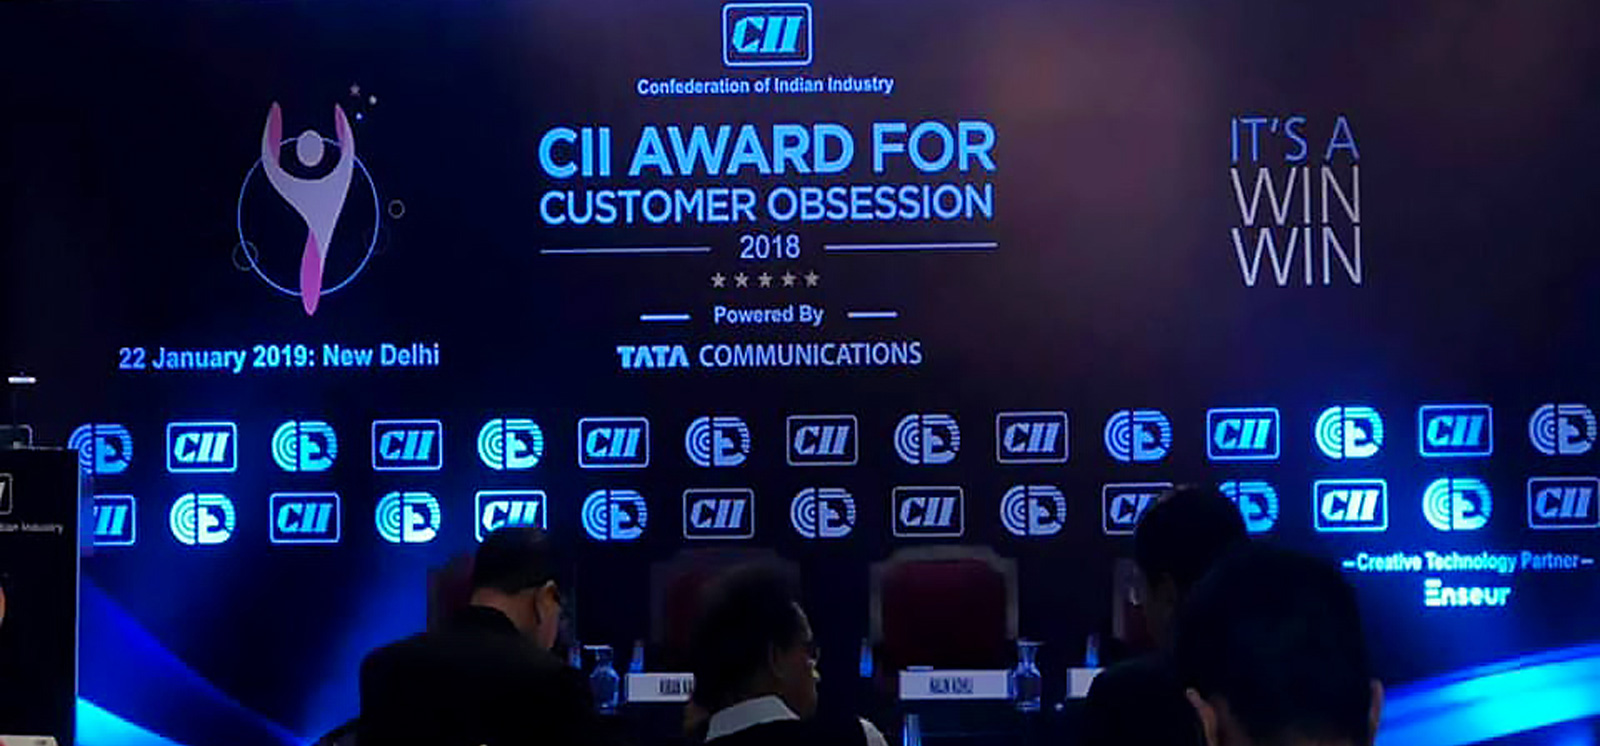 Digital Aptech Pvt. Ltd. Bags the Prestigious CII Award for Customer Obsession 2018